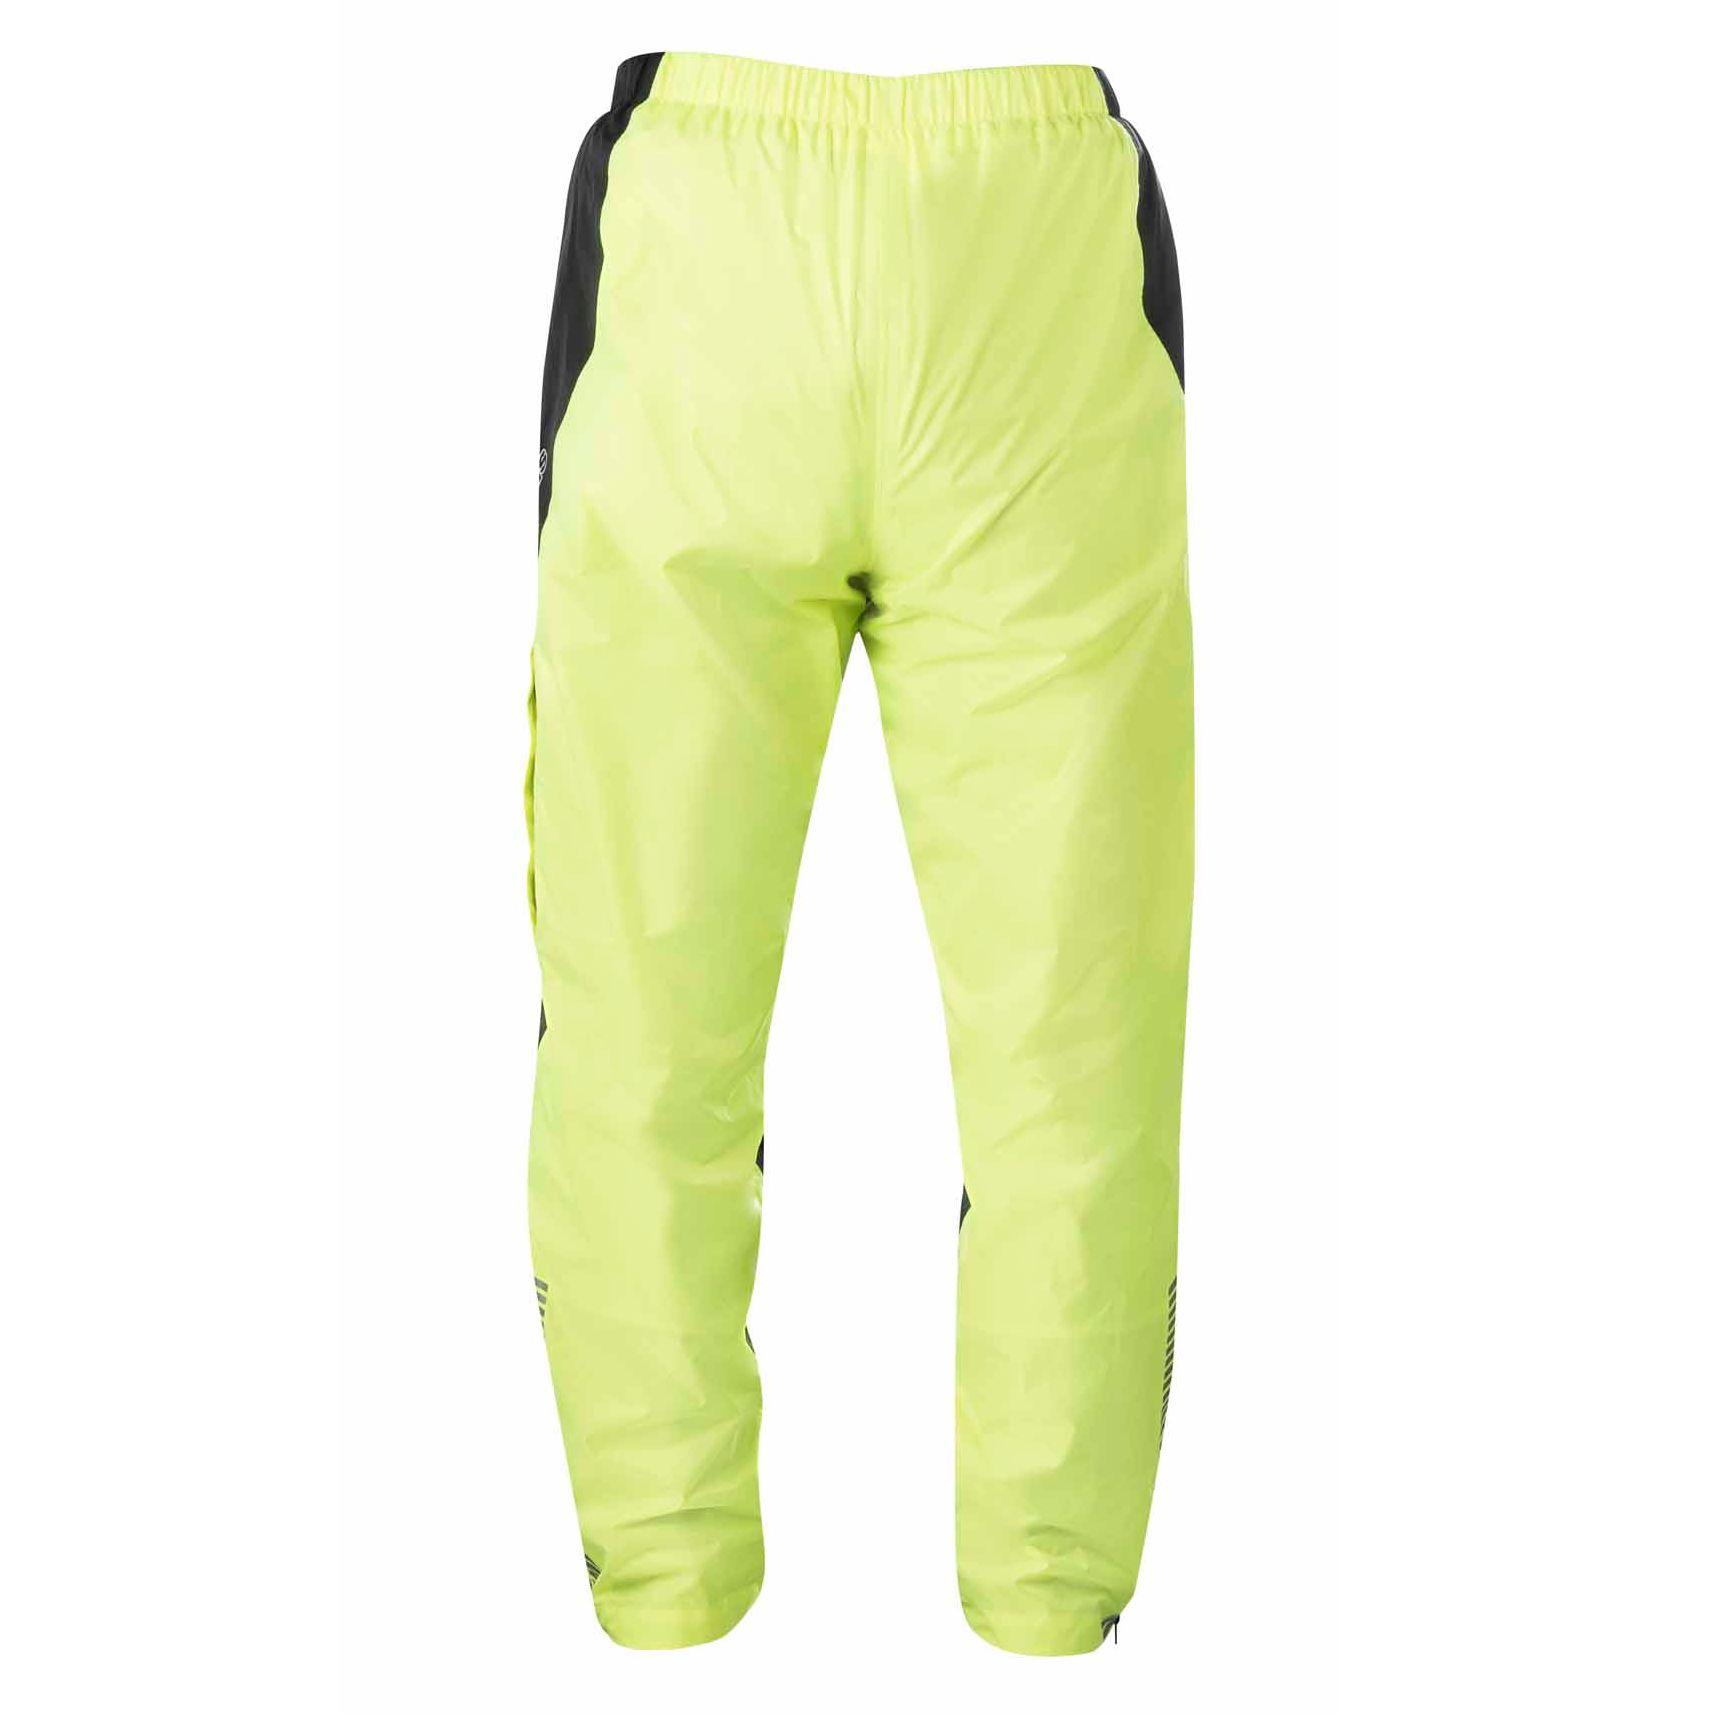 9343c99820c Pantalones impermeable Alpinestars HURRICANE - ProtecciÓn para frio ...